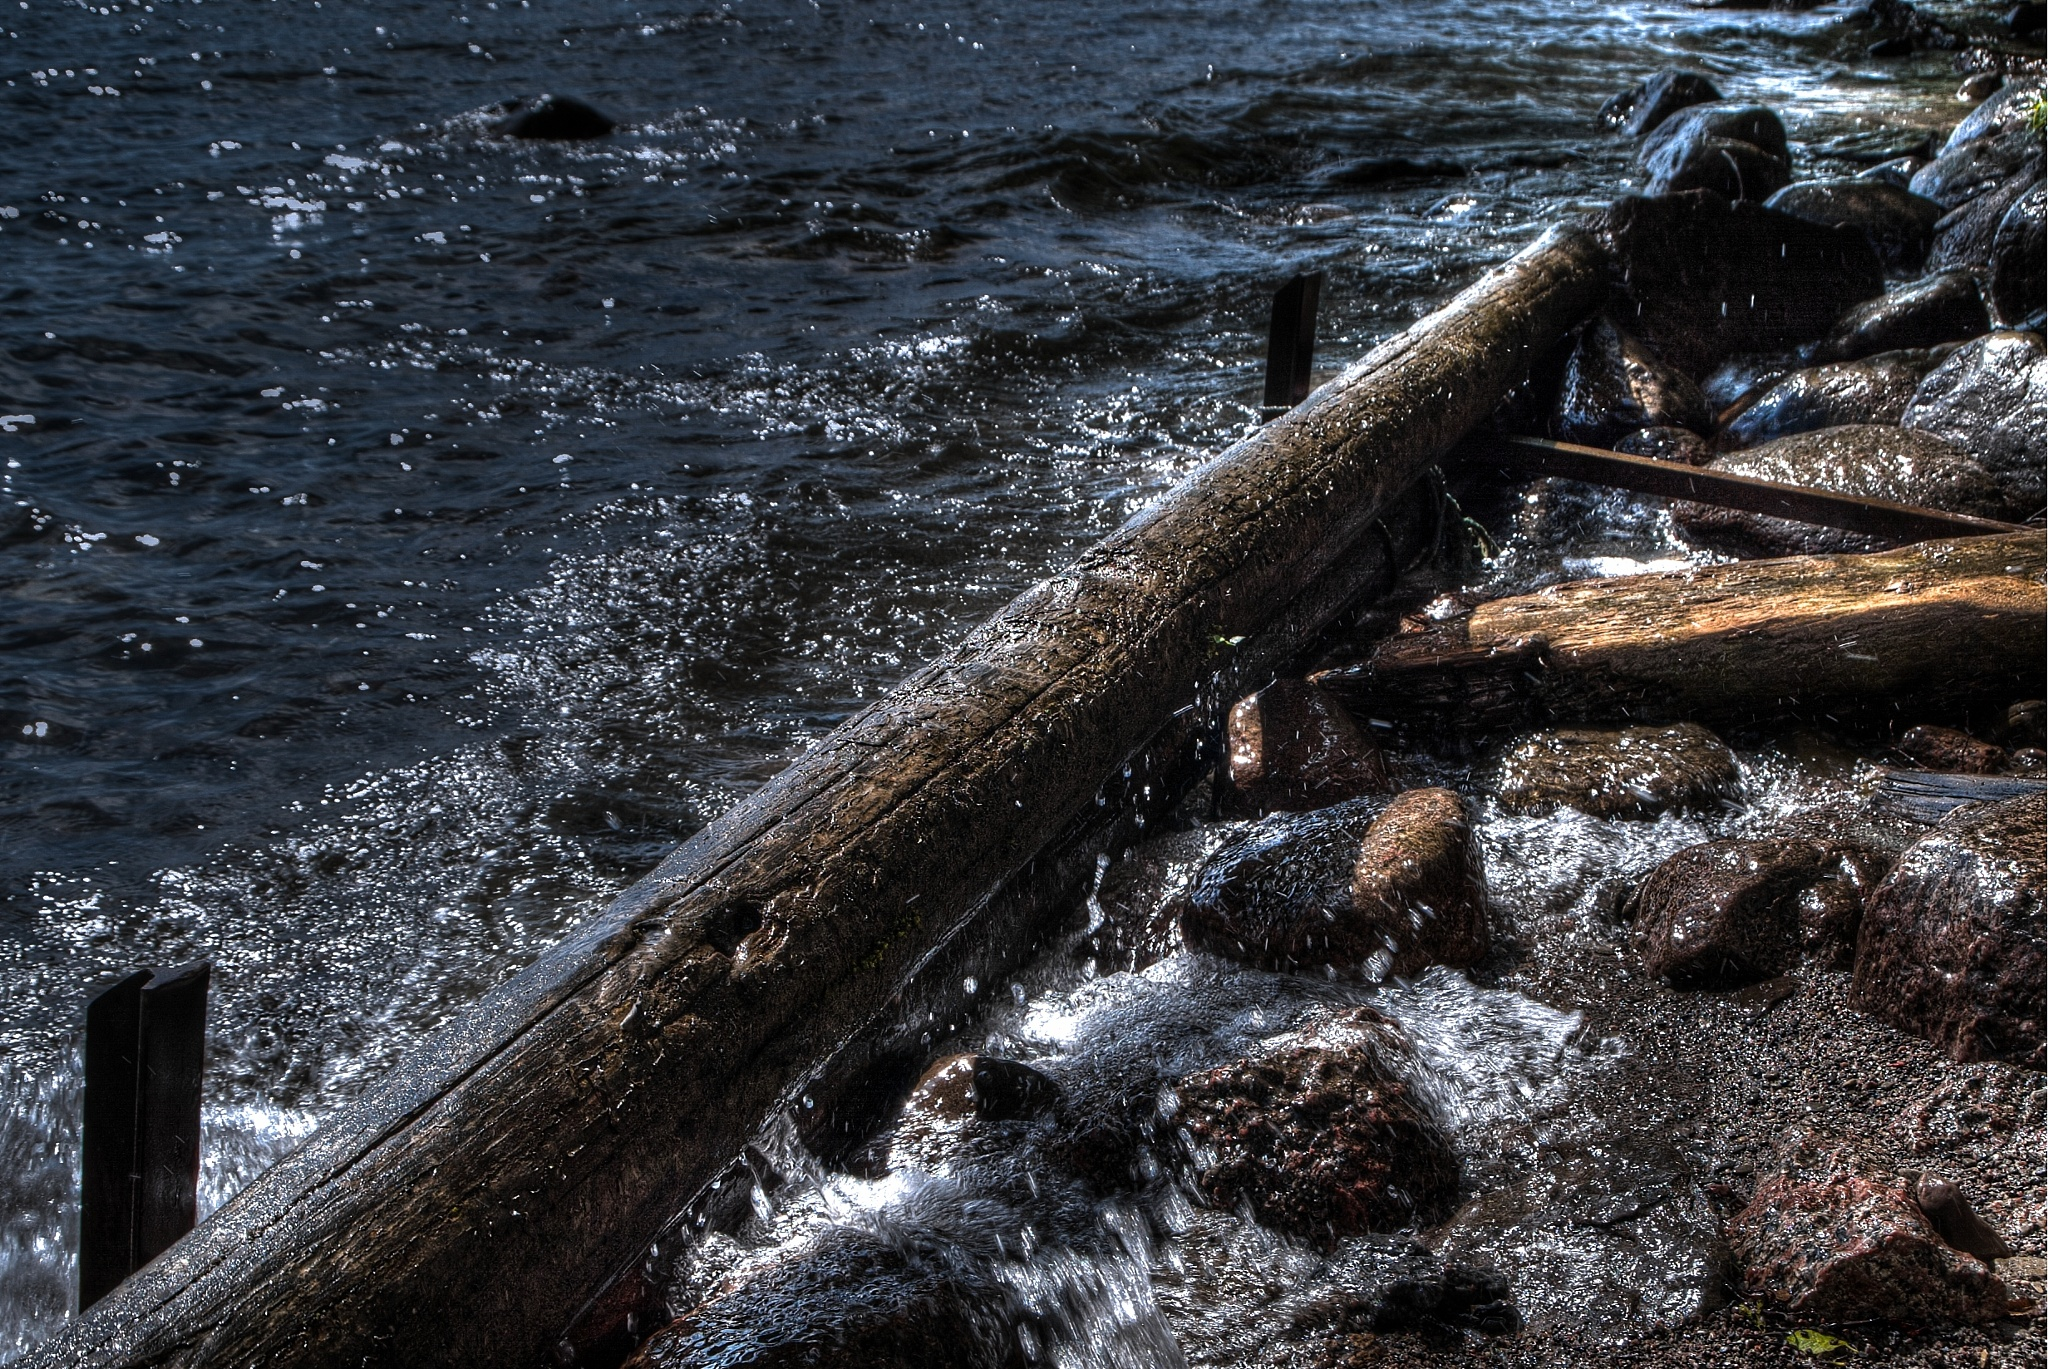 Water splashing on log by Mattias Glimsö